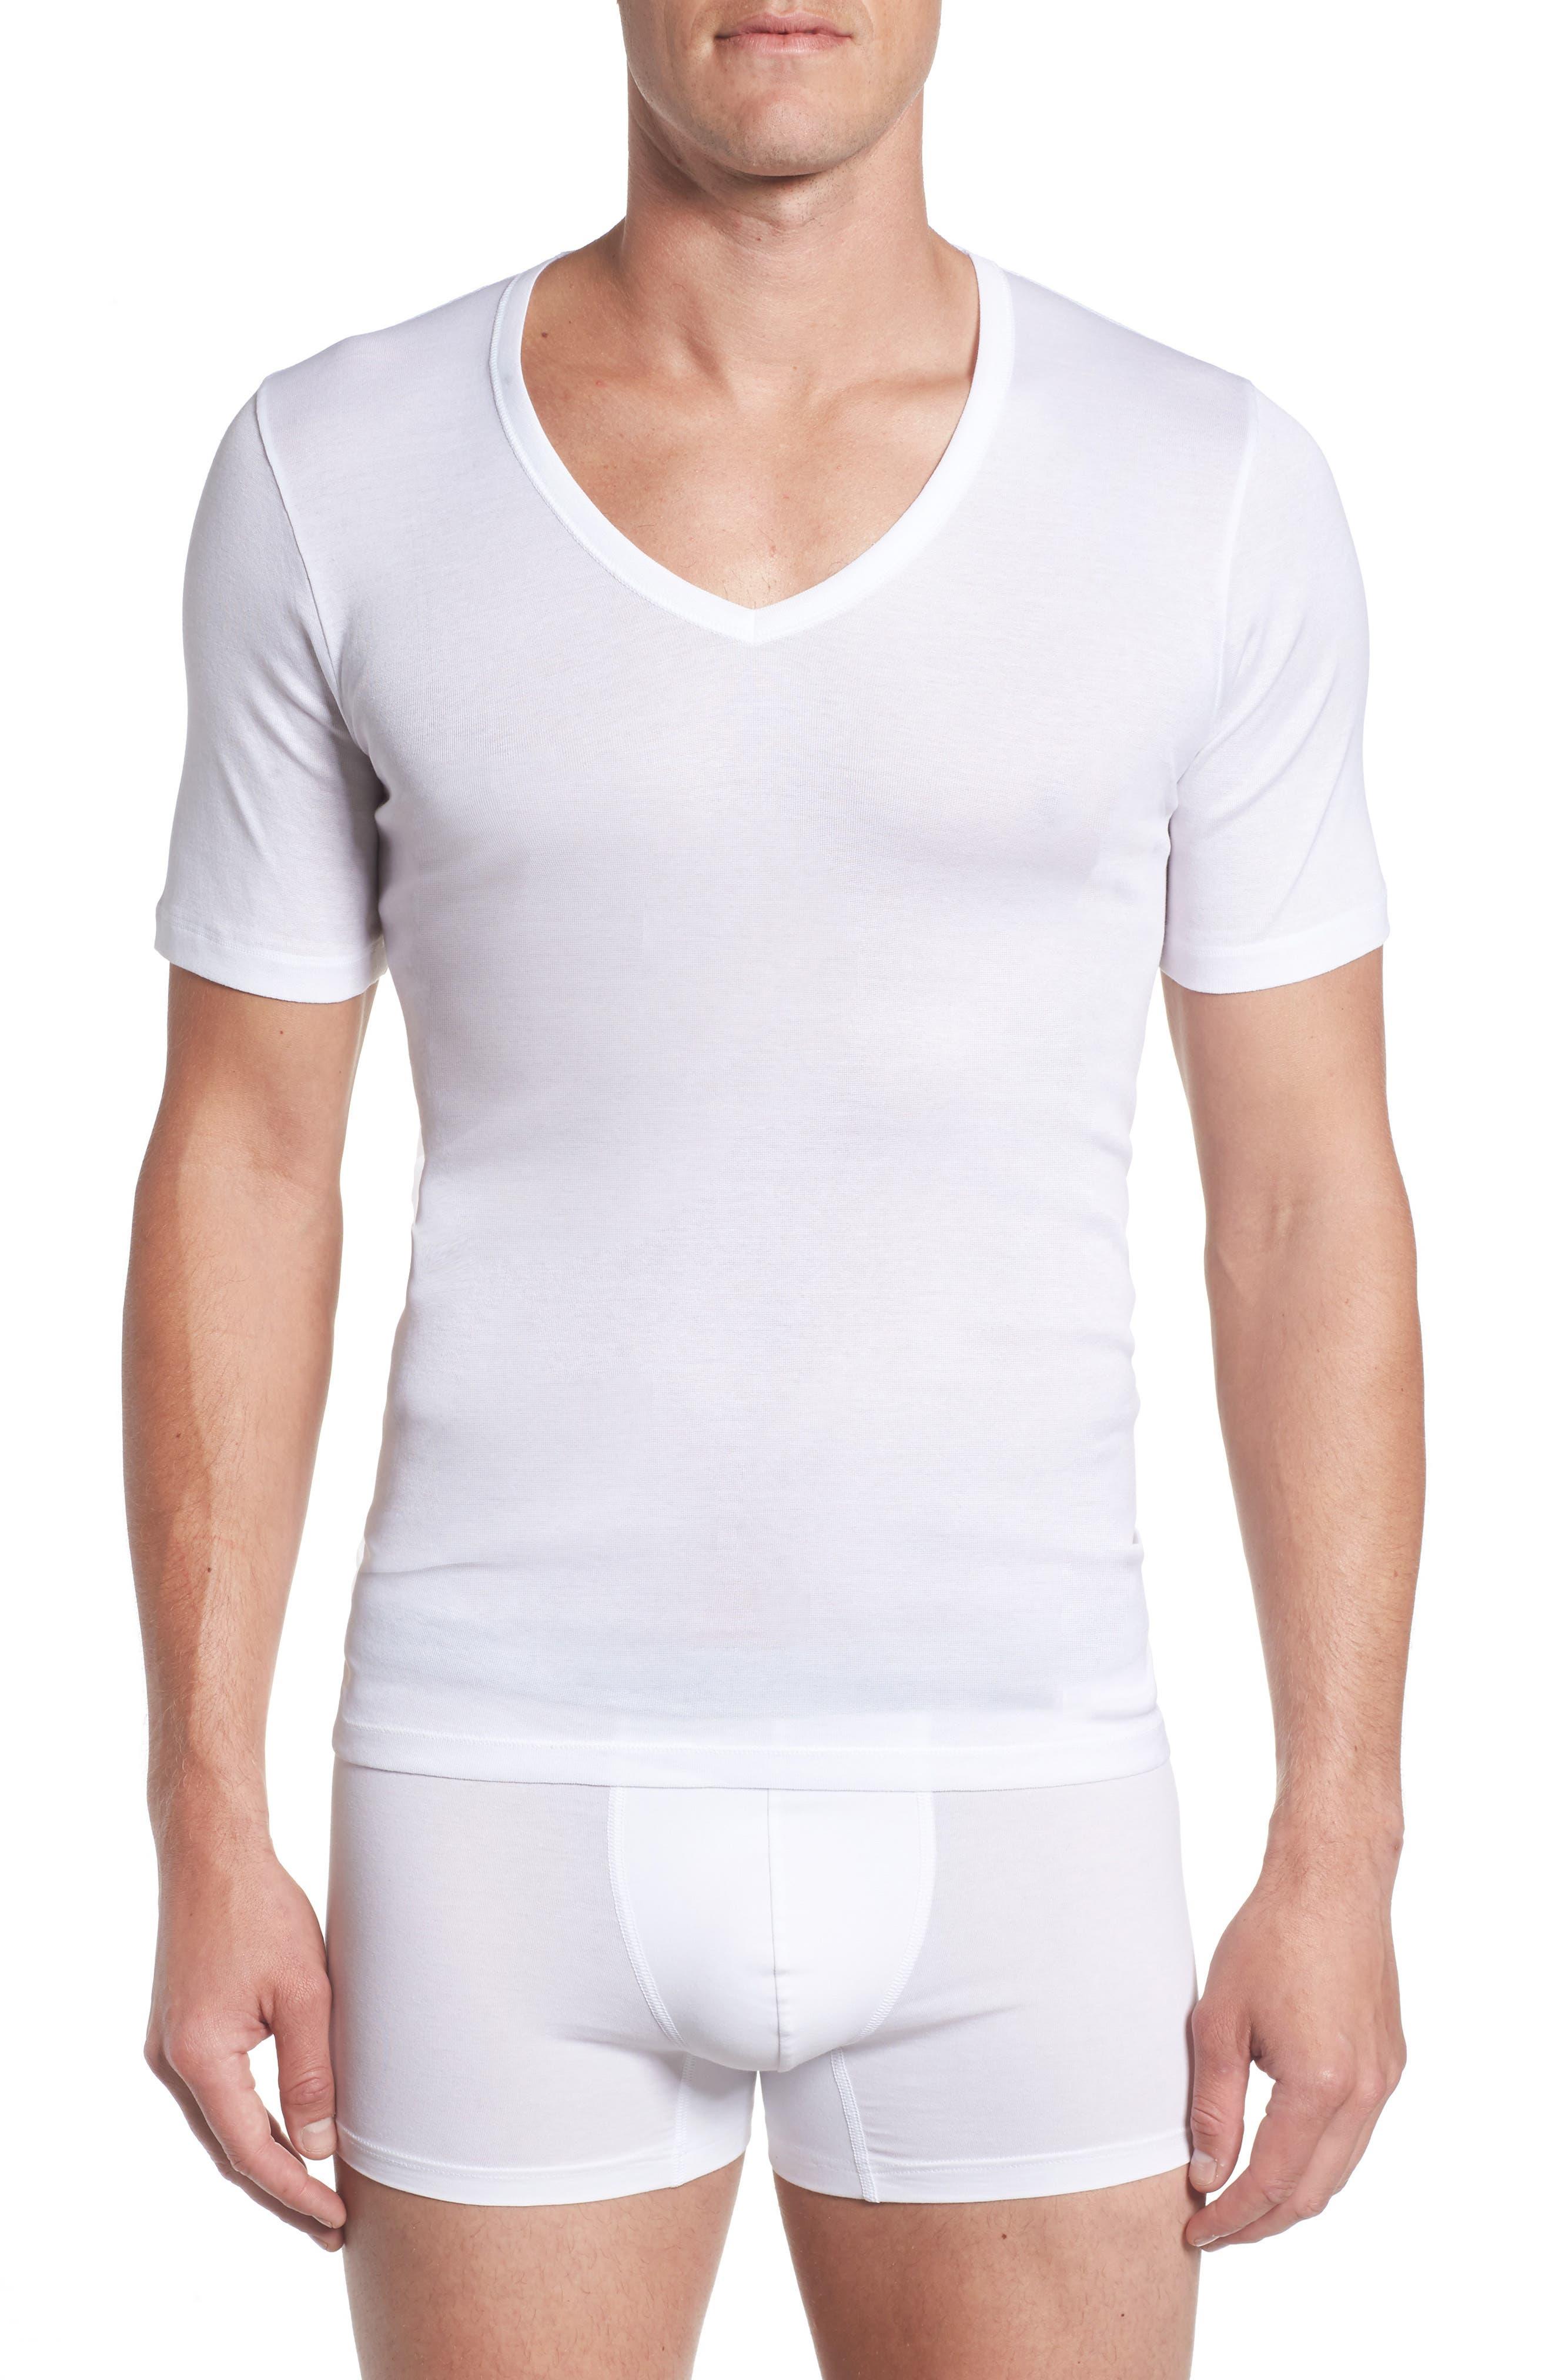 Alternate Image 1 Selected - Hanro Cotton Pure V-Neck T-Shirt